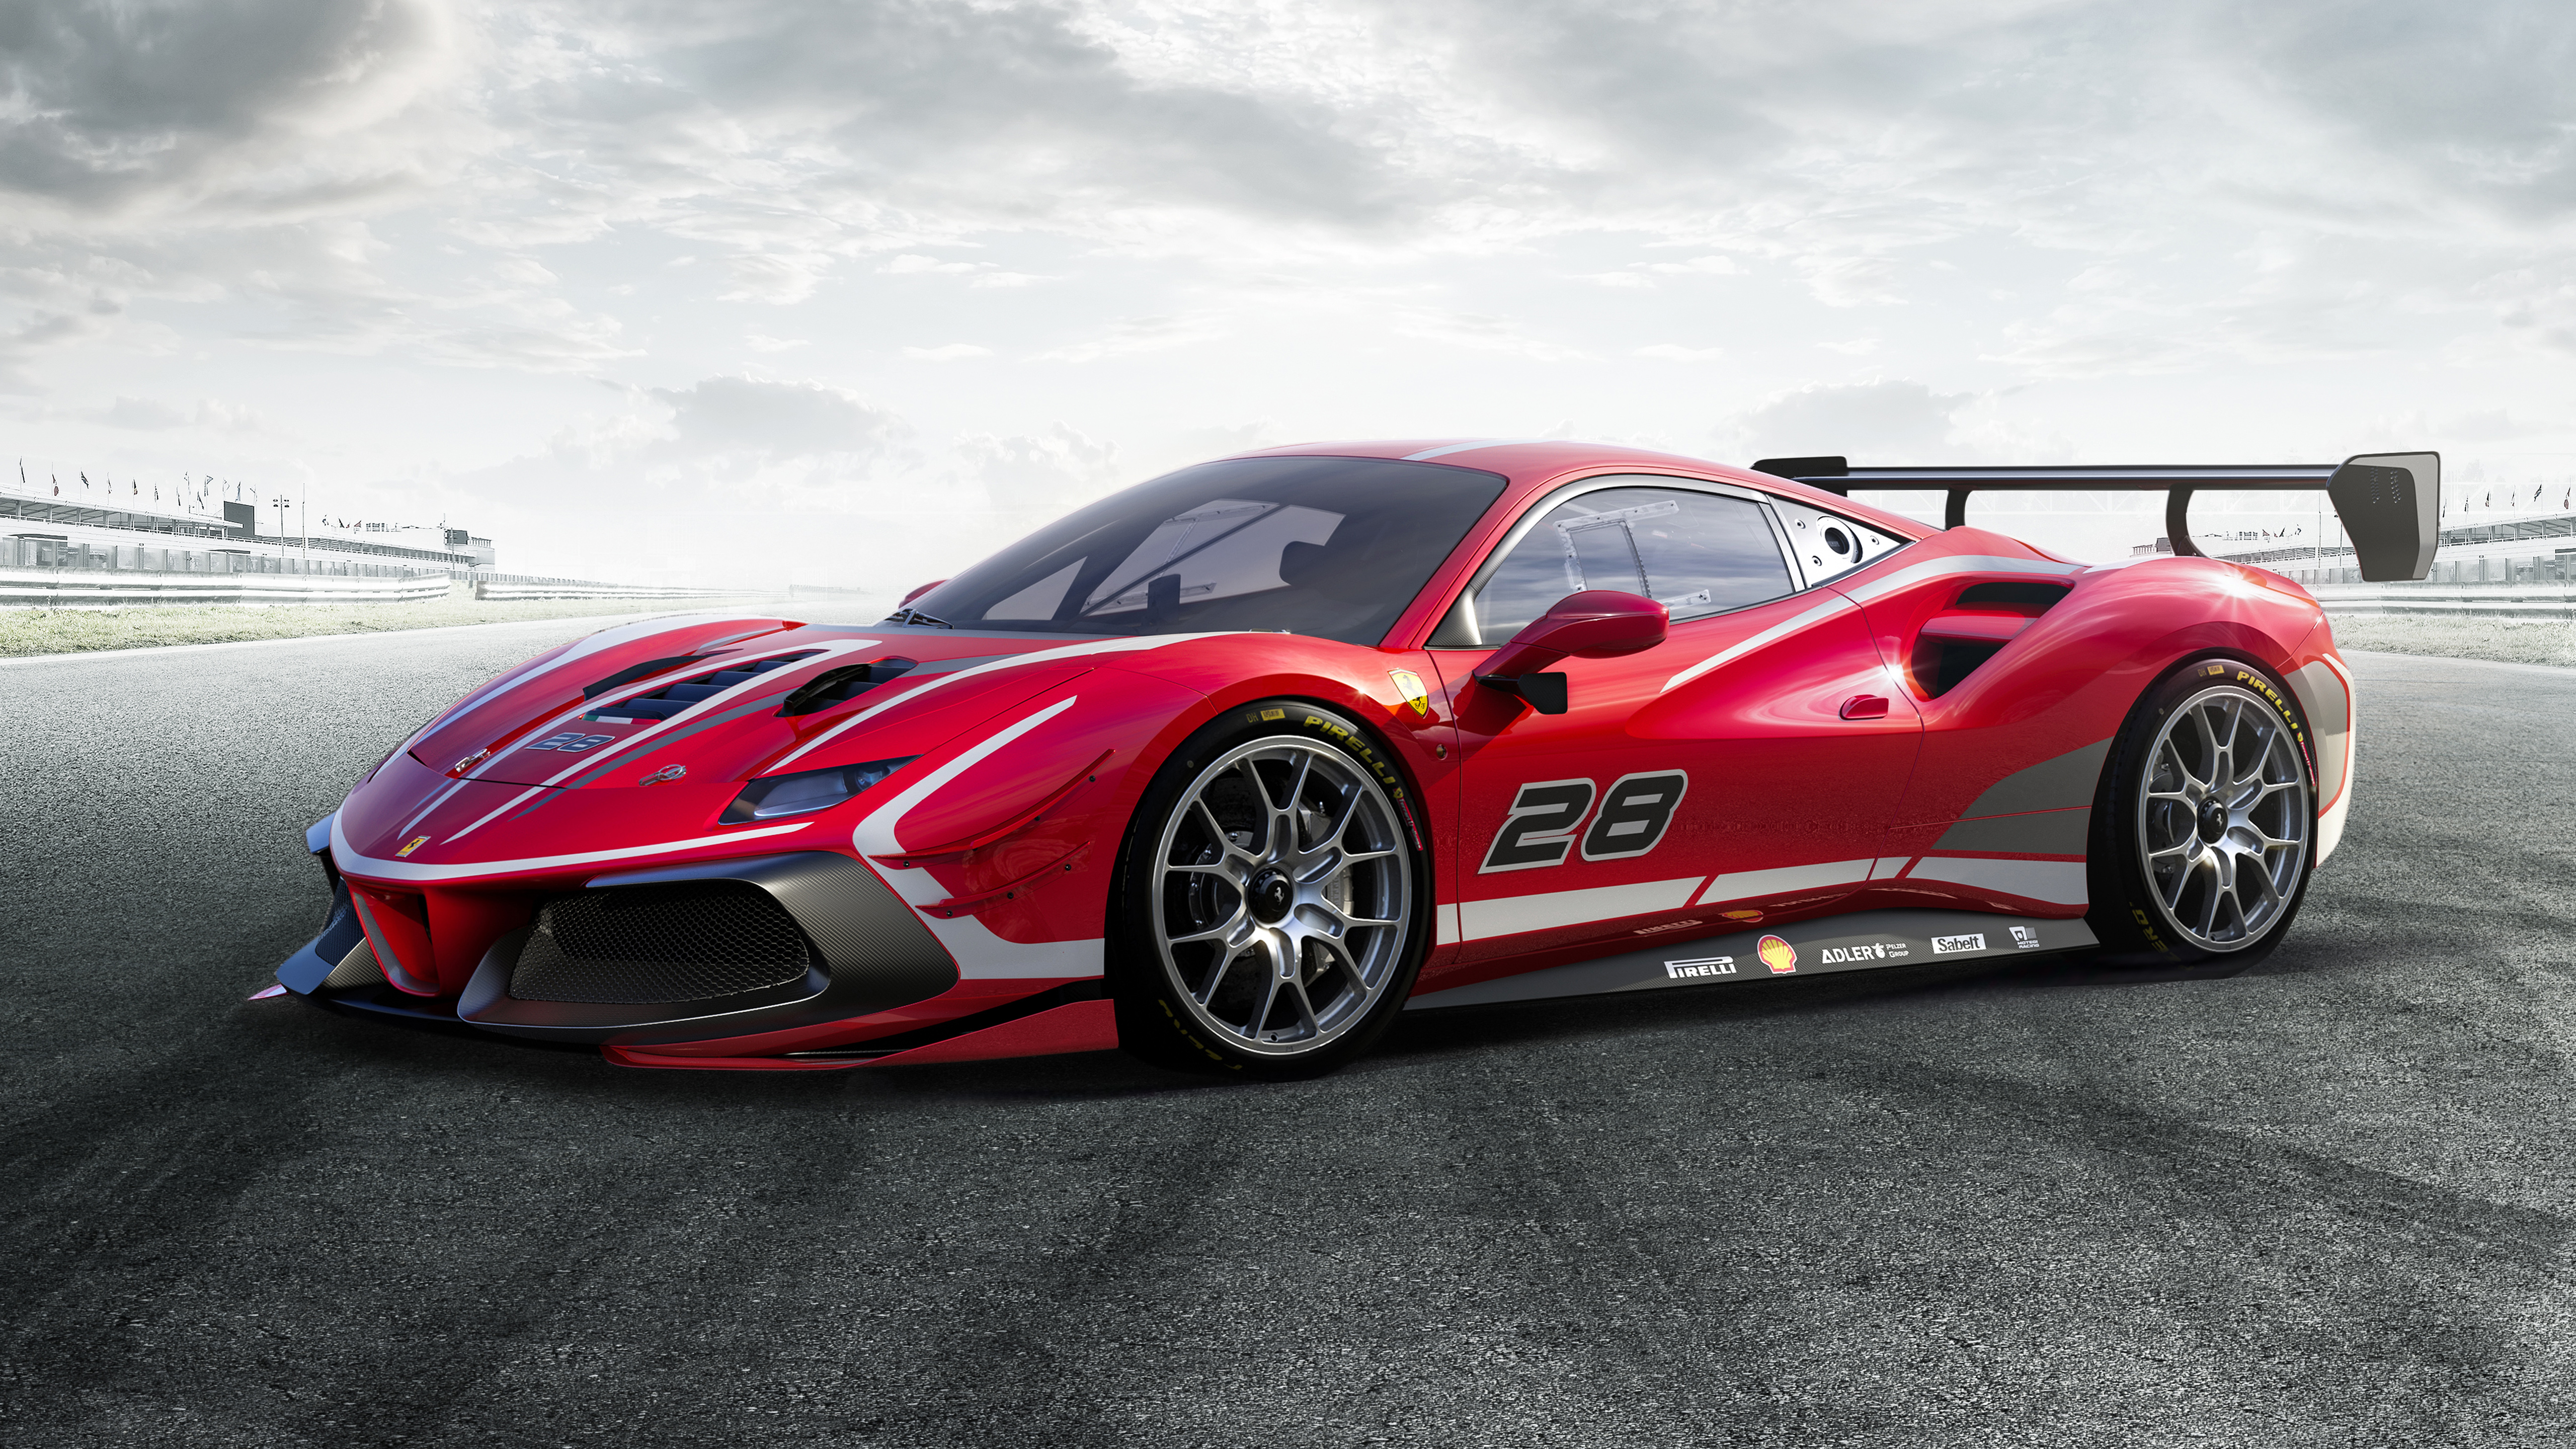 Ferrari 488 Challenge Evo 2020 5K Wallpaper HD Car Wallpapers 5120x2880